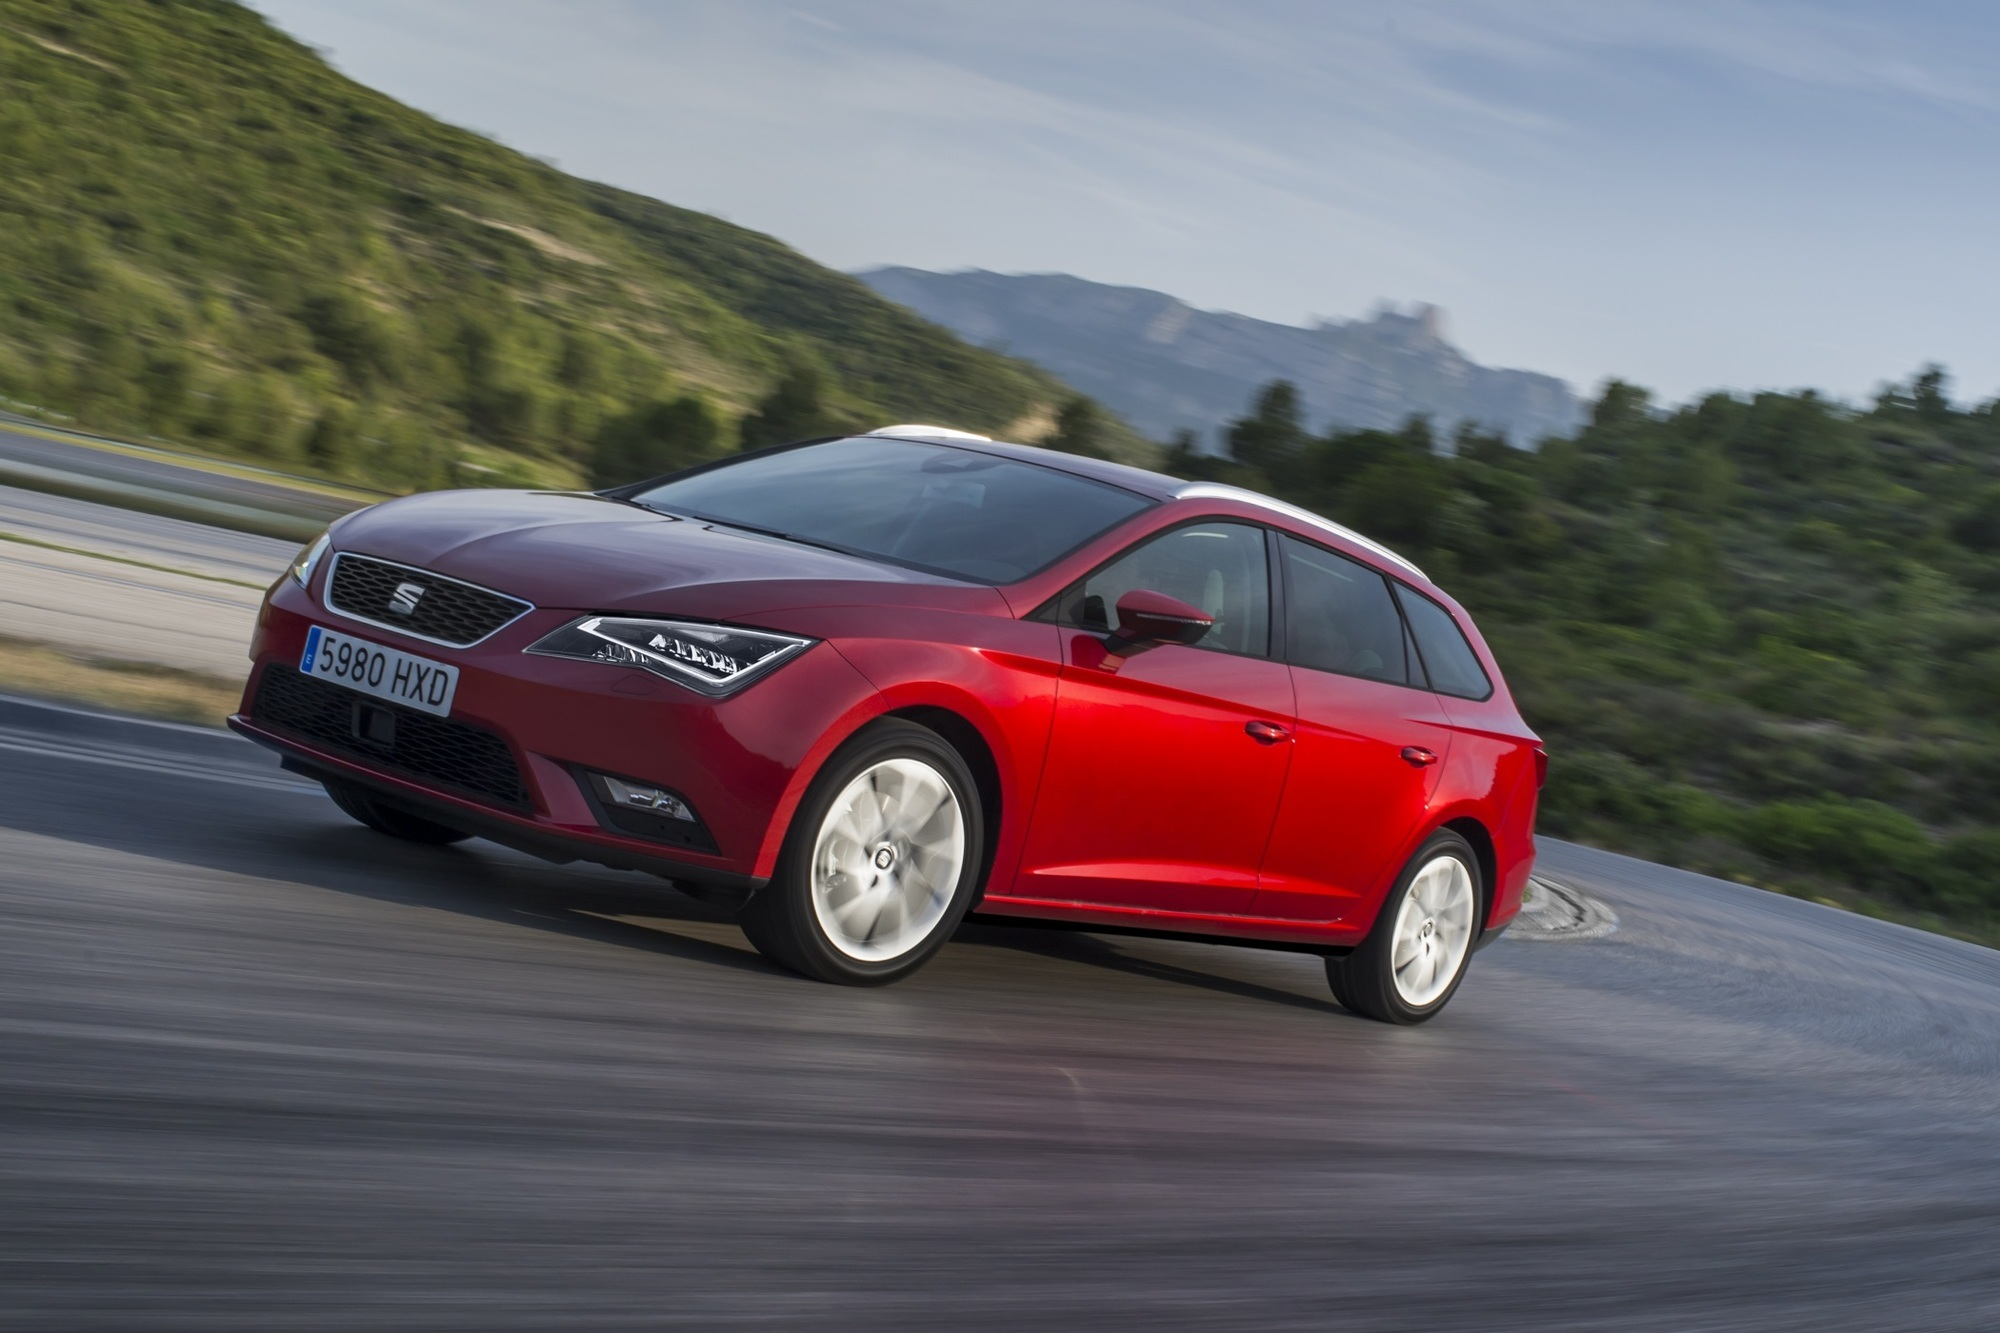 Fahrbericht: Seat Leon ST 4drive - Grip-Tuning